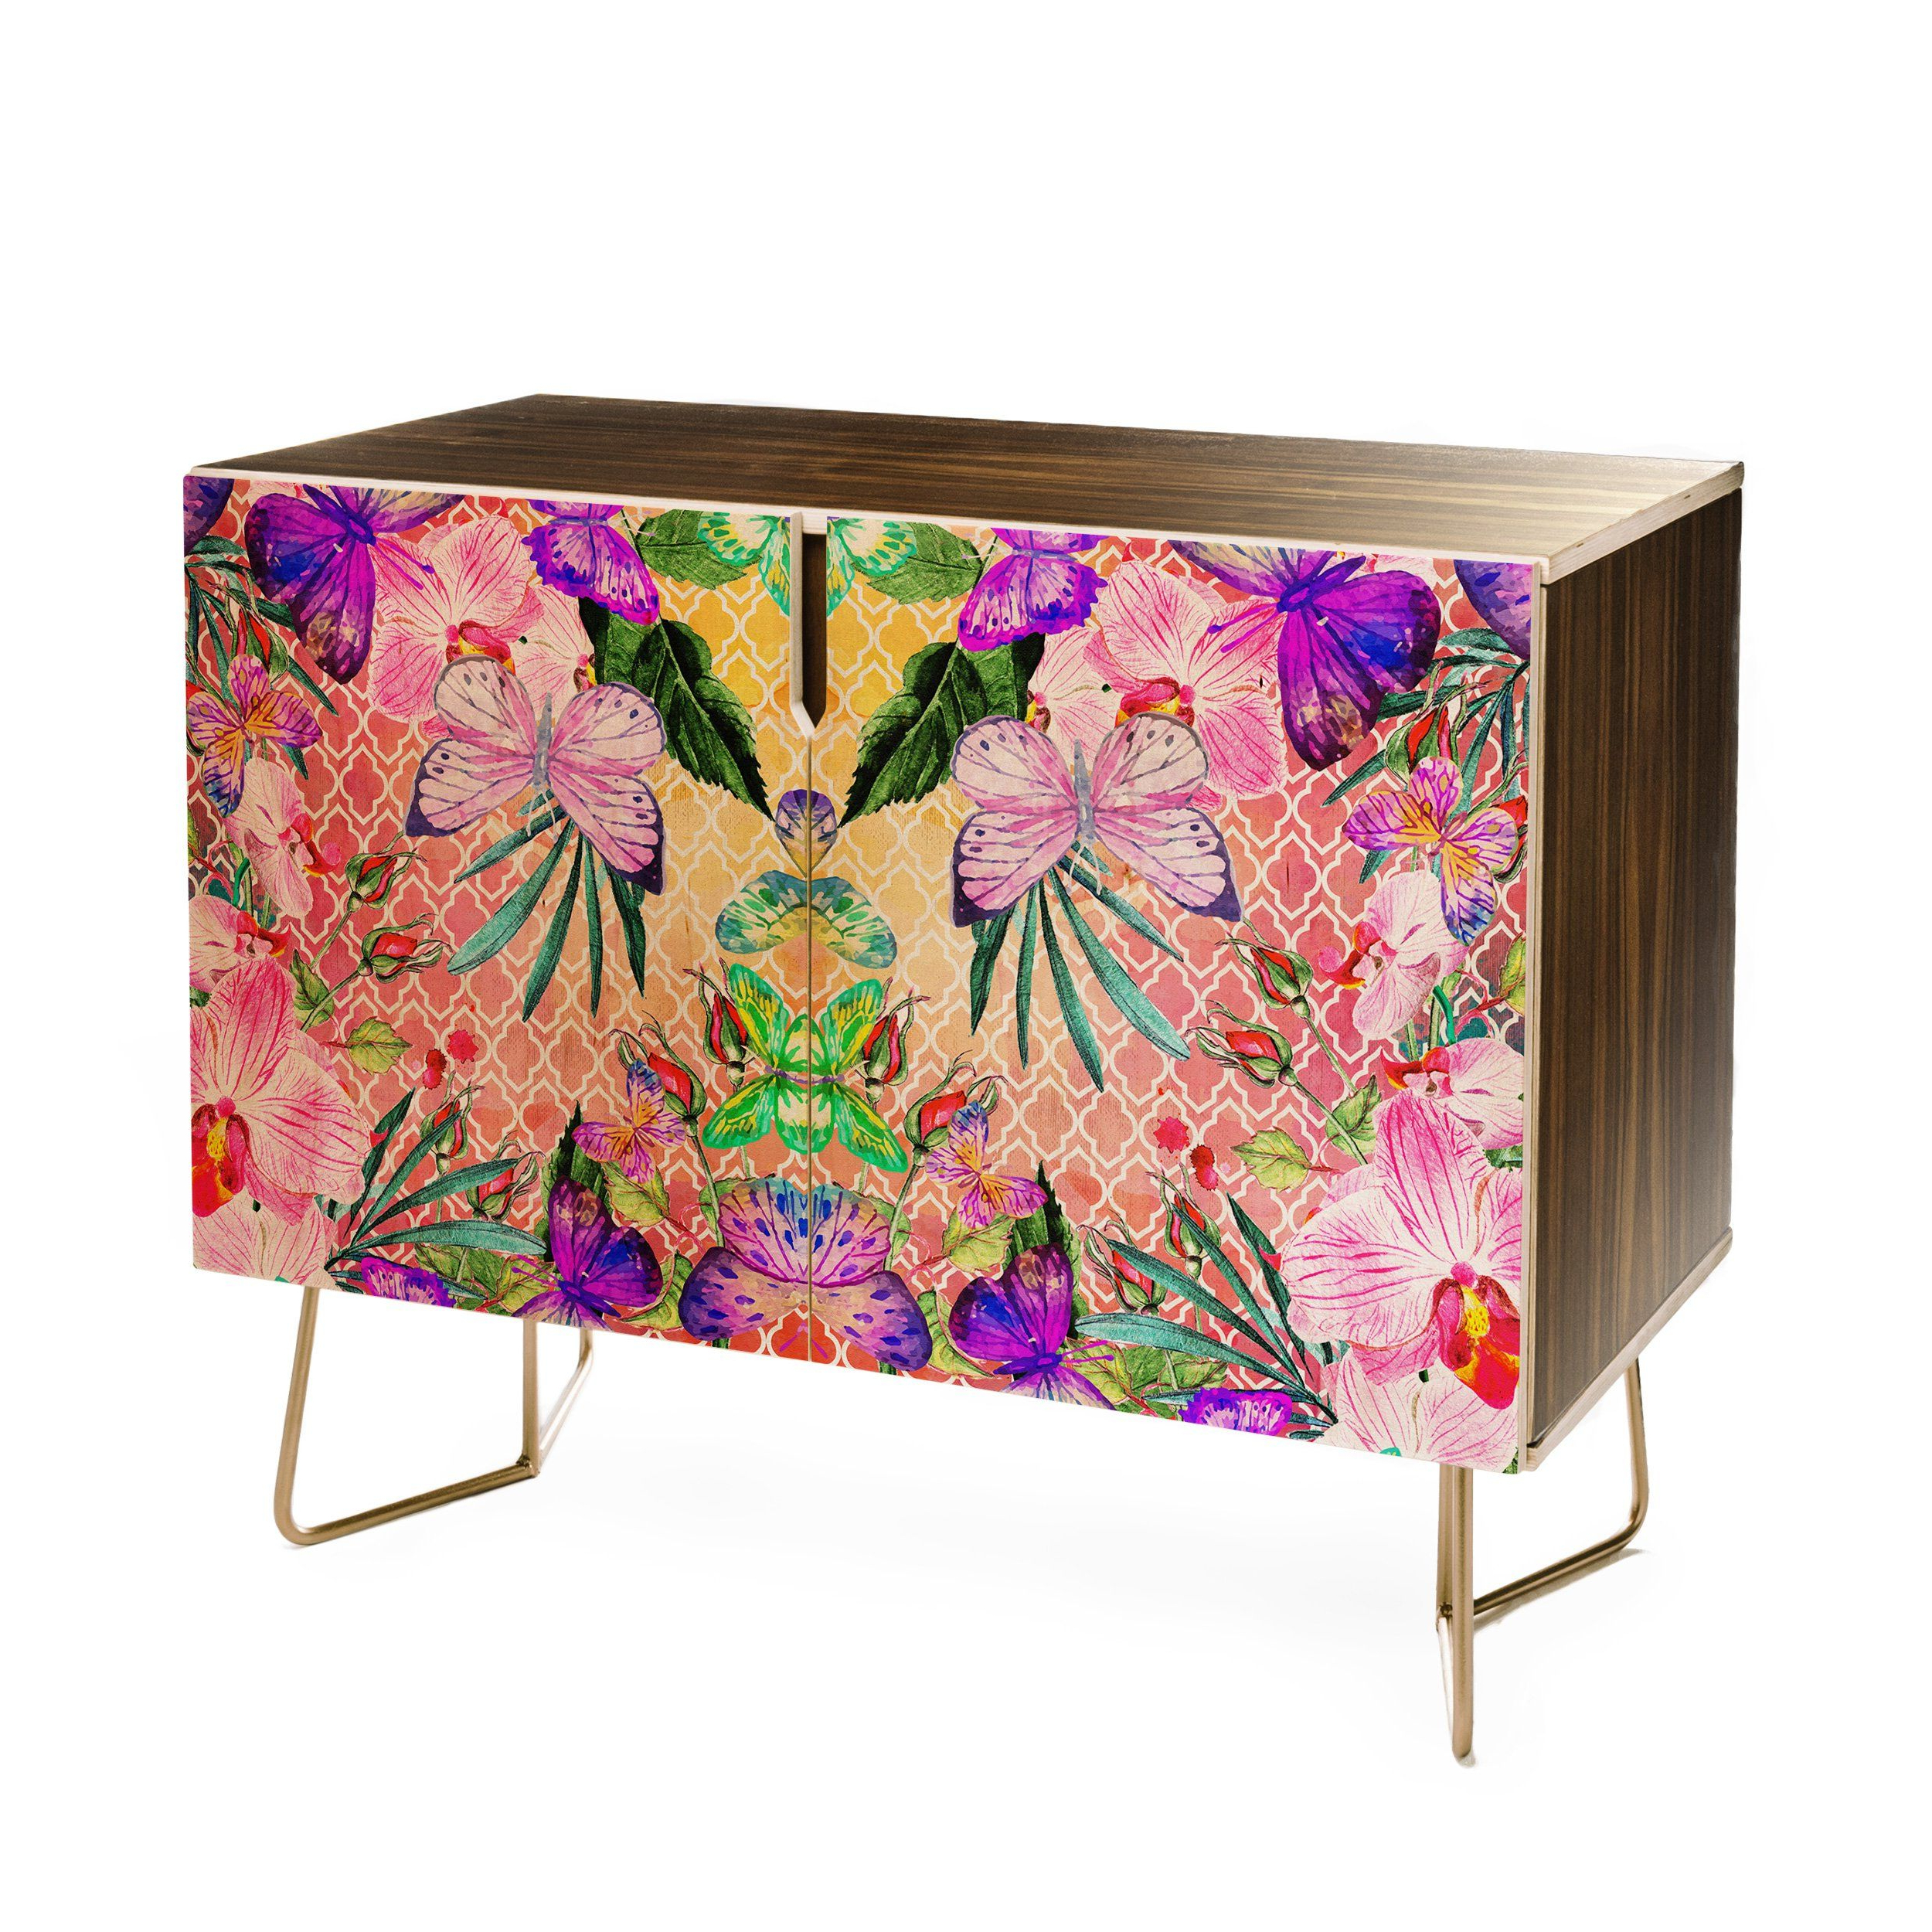 Marta Barragan Camarasa Mosaic Of Nature And Butterflies Regarding Purple Floral Credenzas (View 6 of 20)